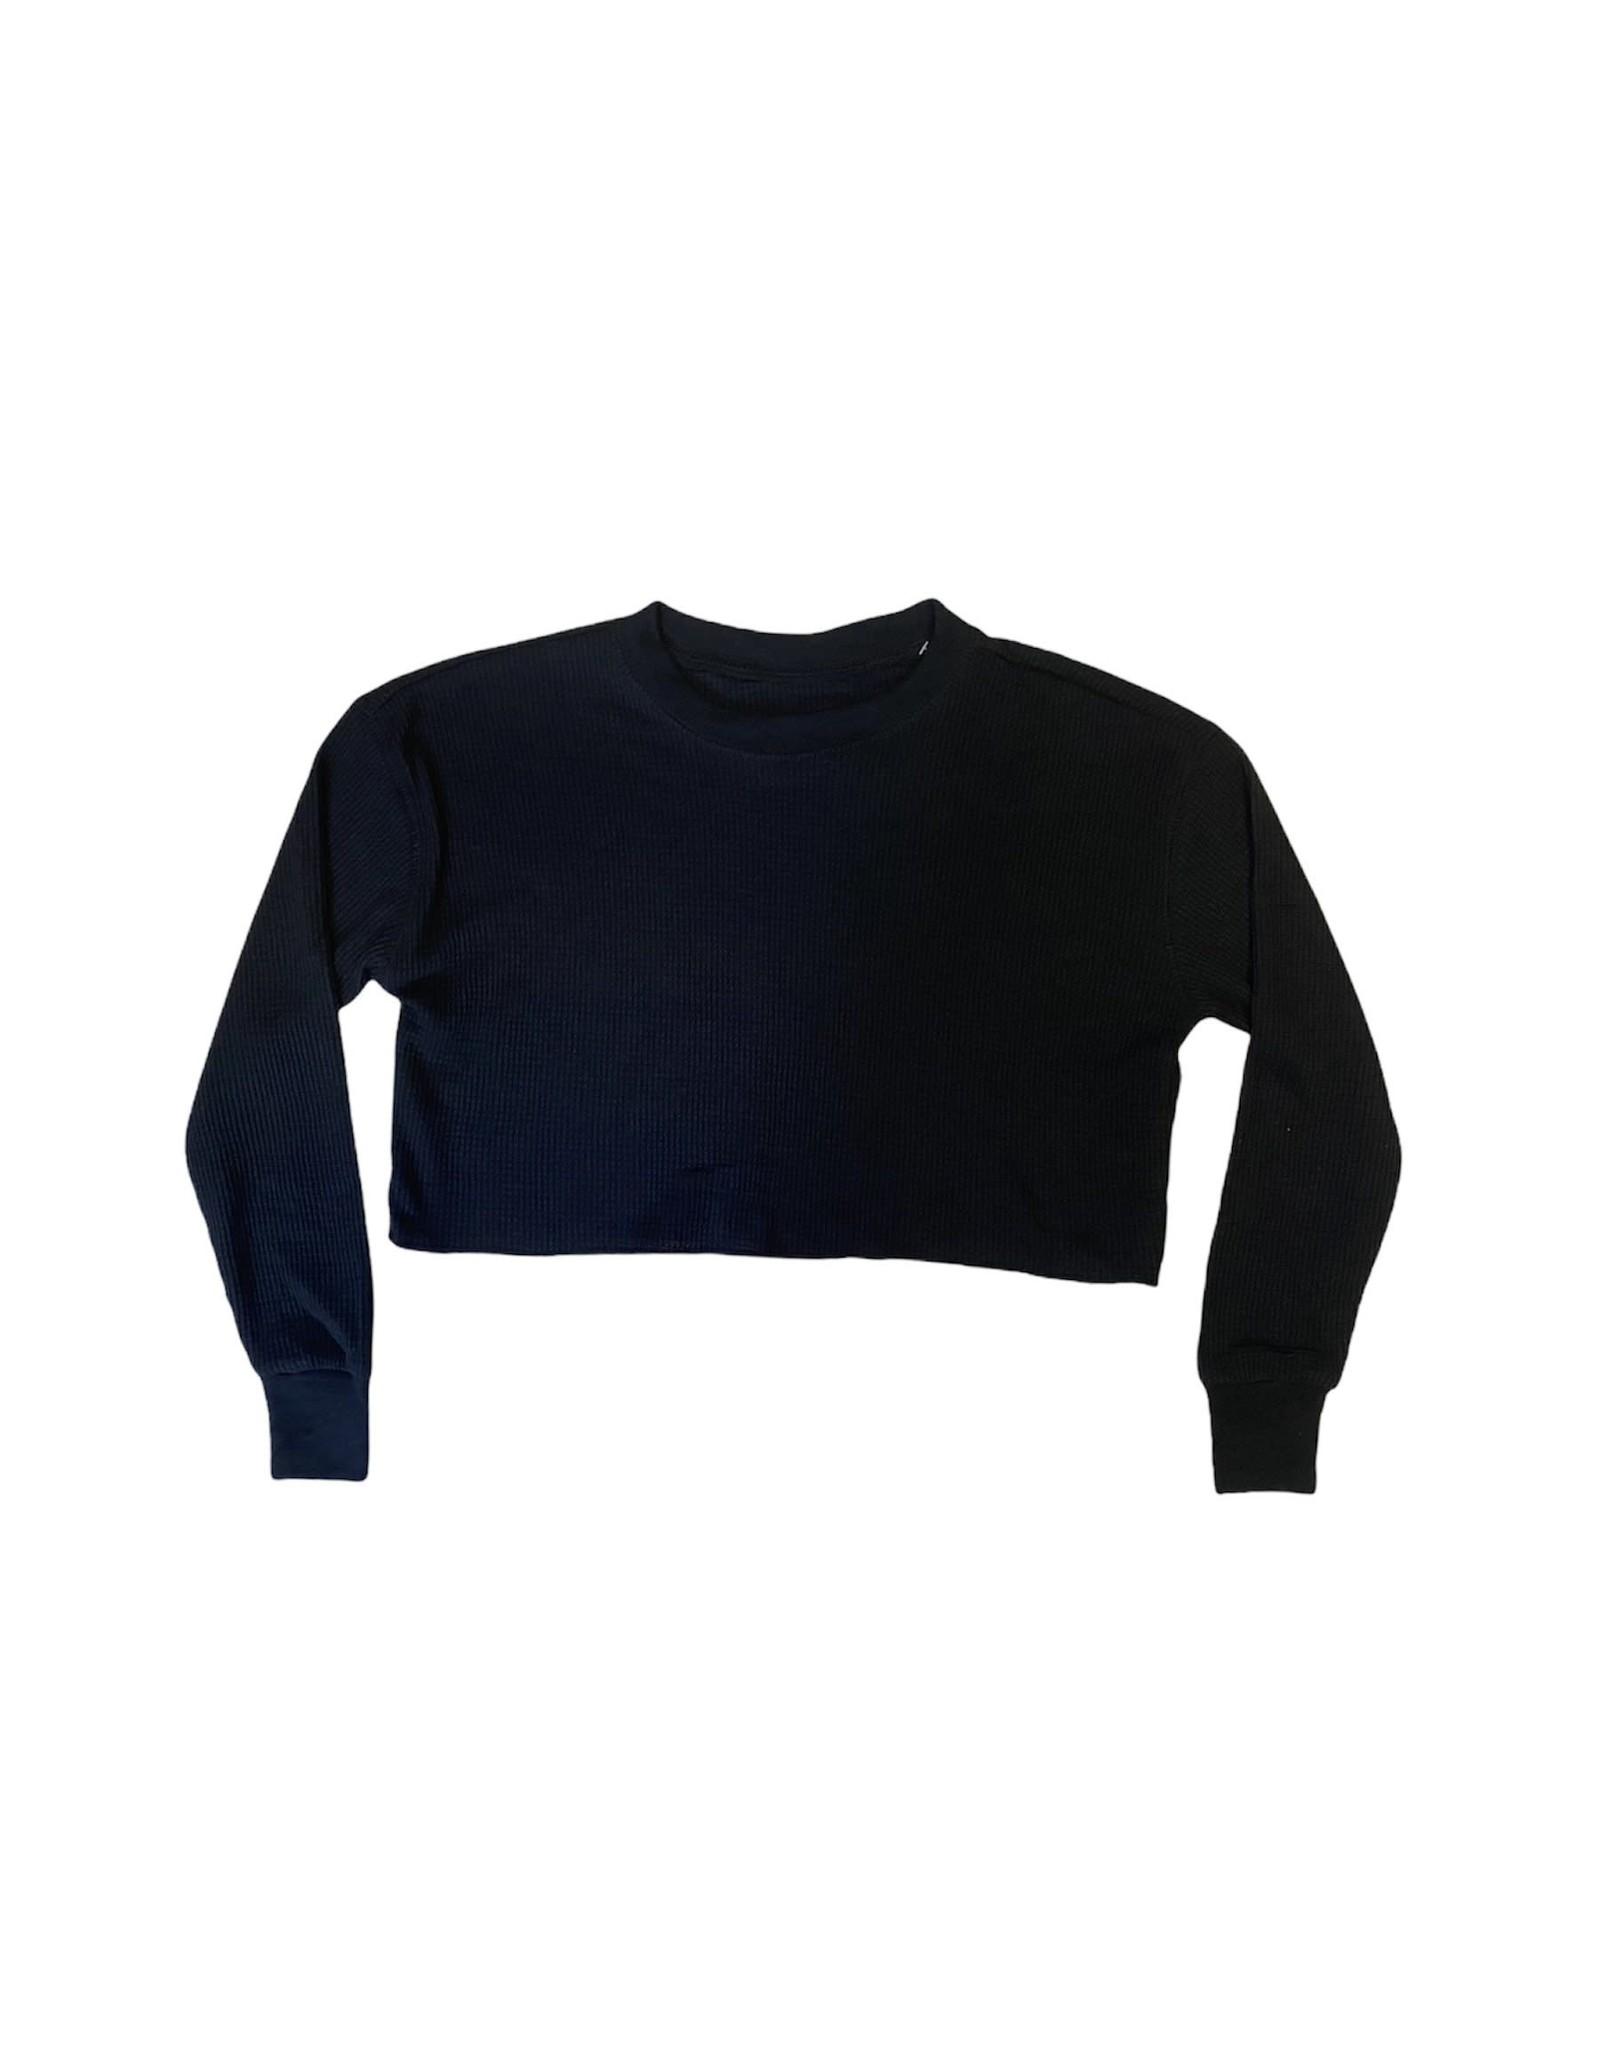 KATIEJNYC KJ Cooper Shirt